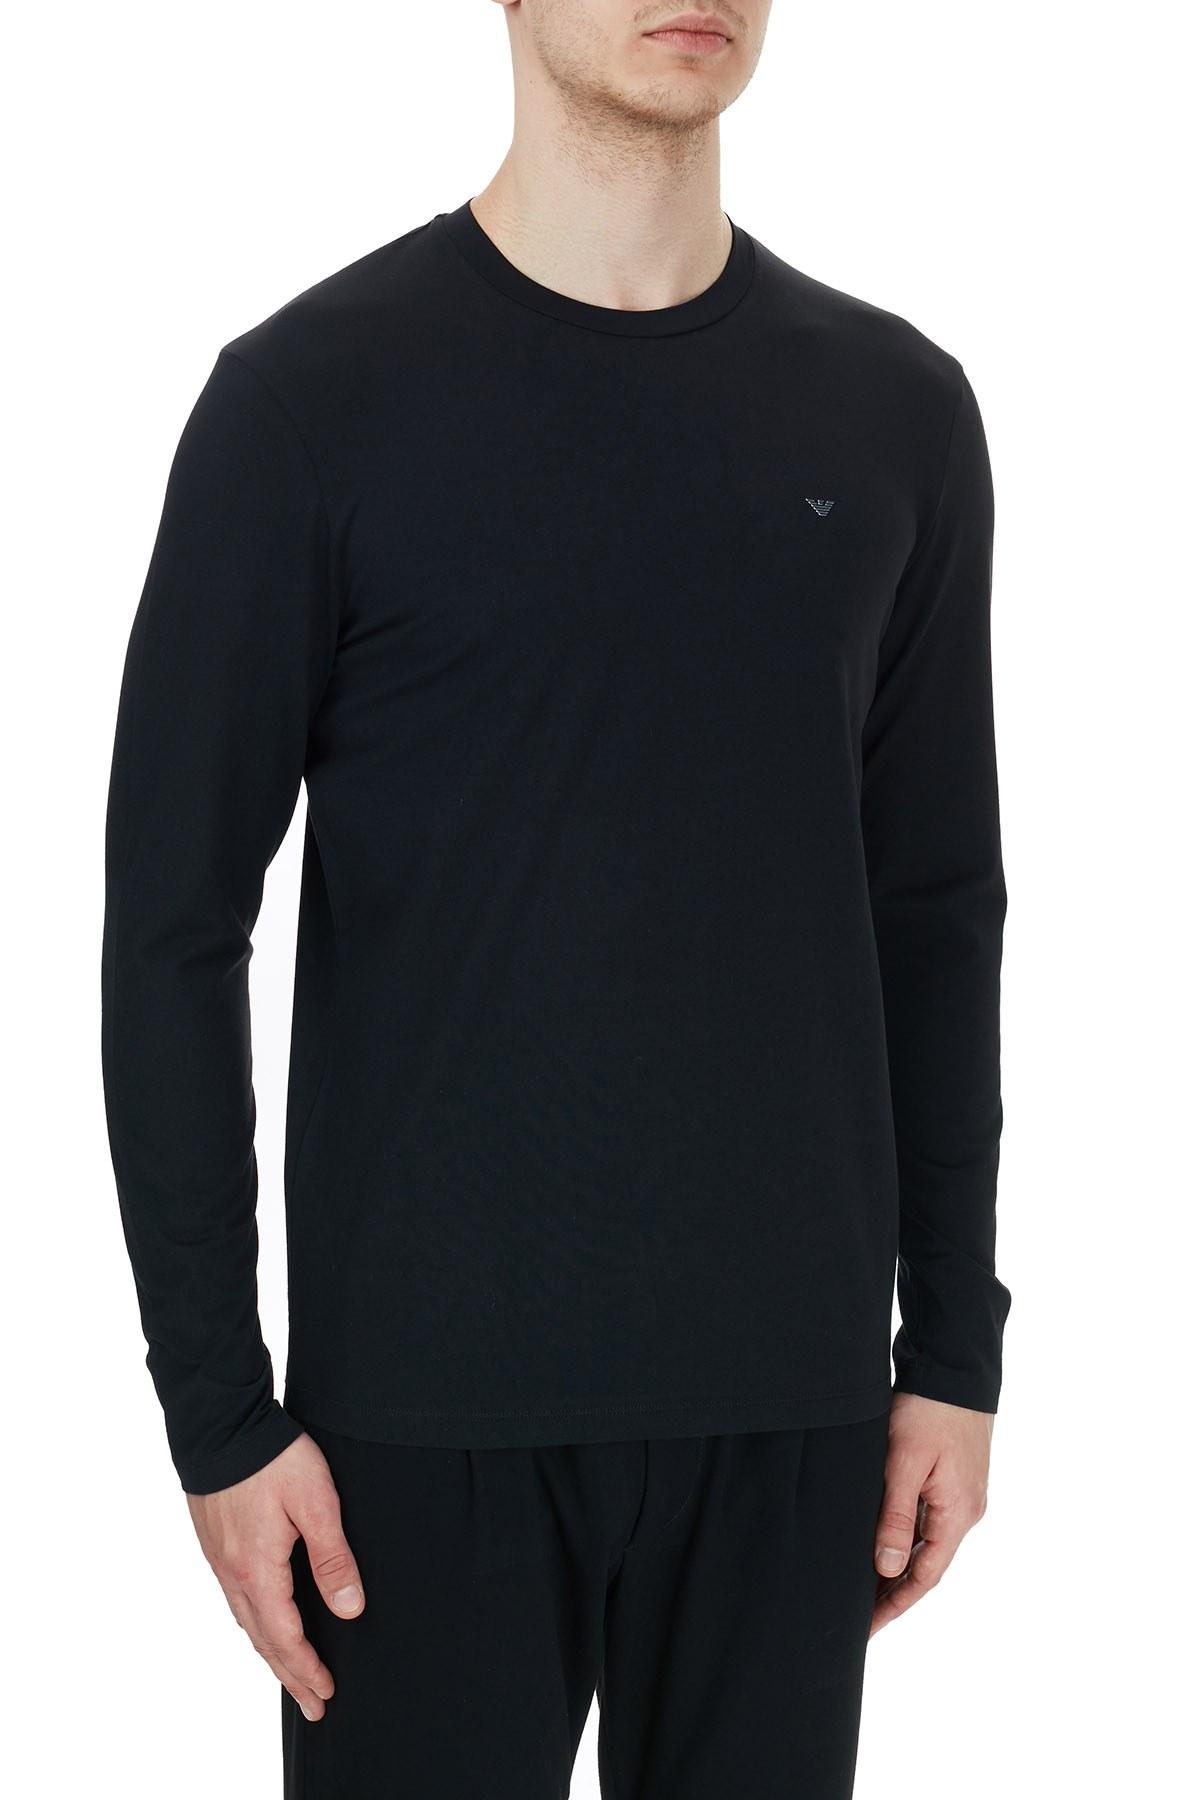 Emporio Armani Bisiklet Yaka Pamuklu Erkek T Shirt 6H1TS3 1JJRZ 0999 SİYAH